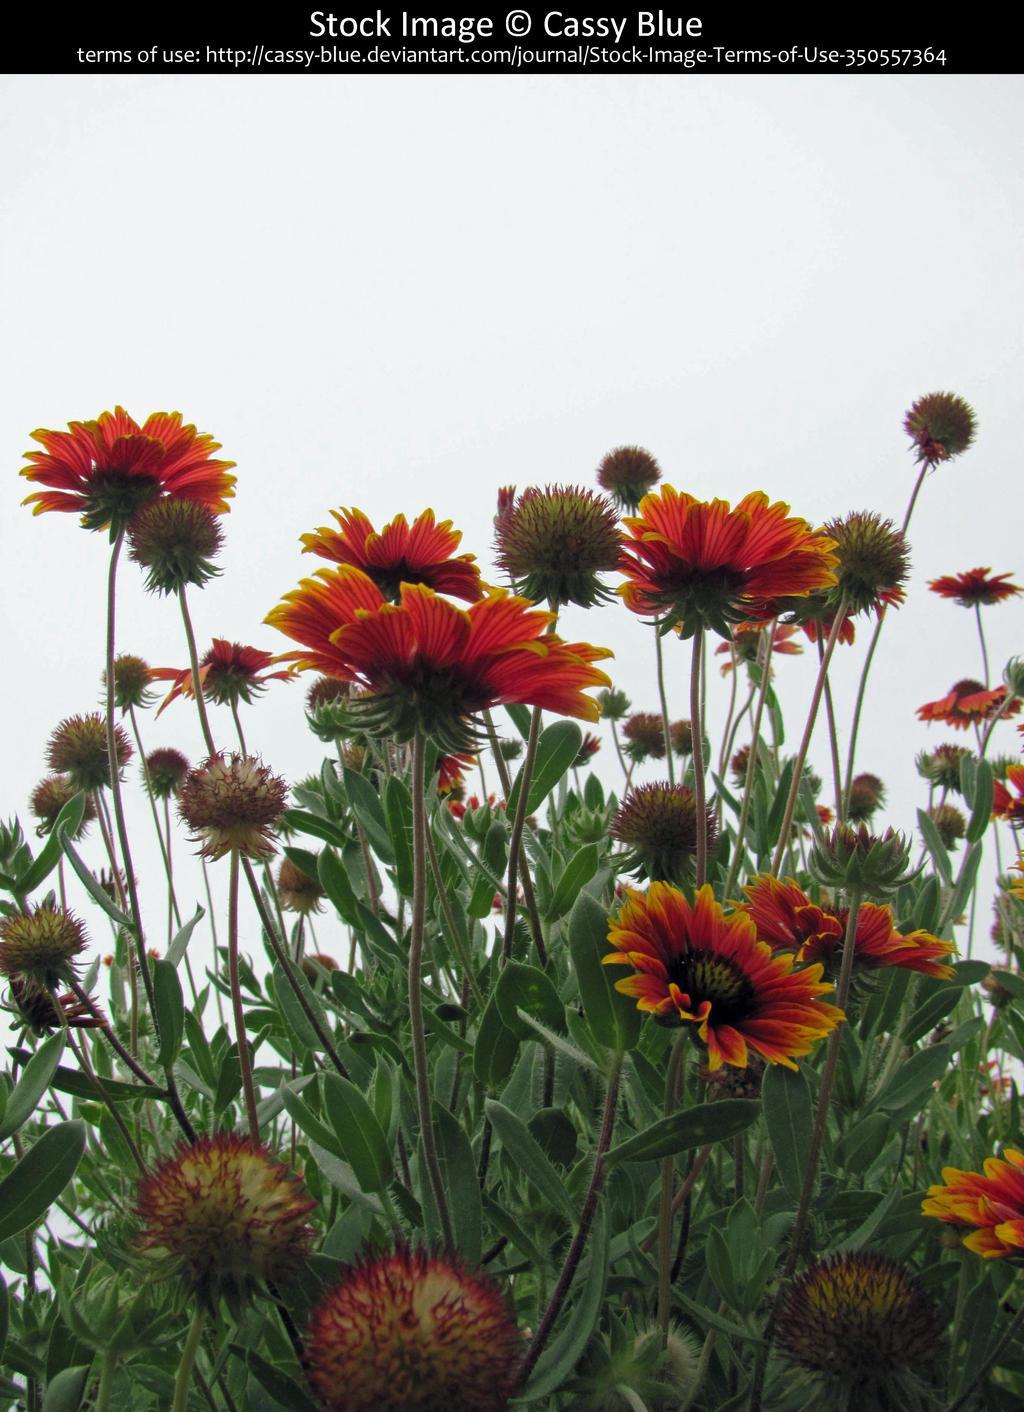 Blanket Flowers Stock by Cassy-Blue